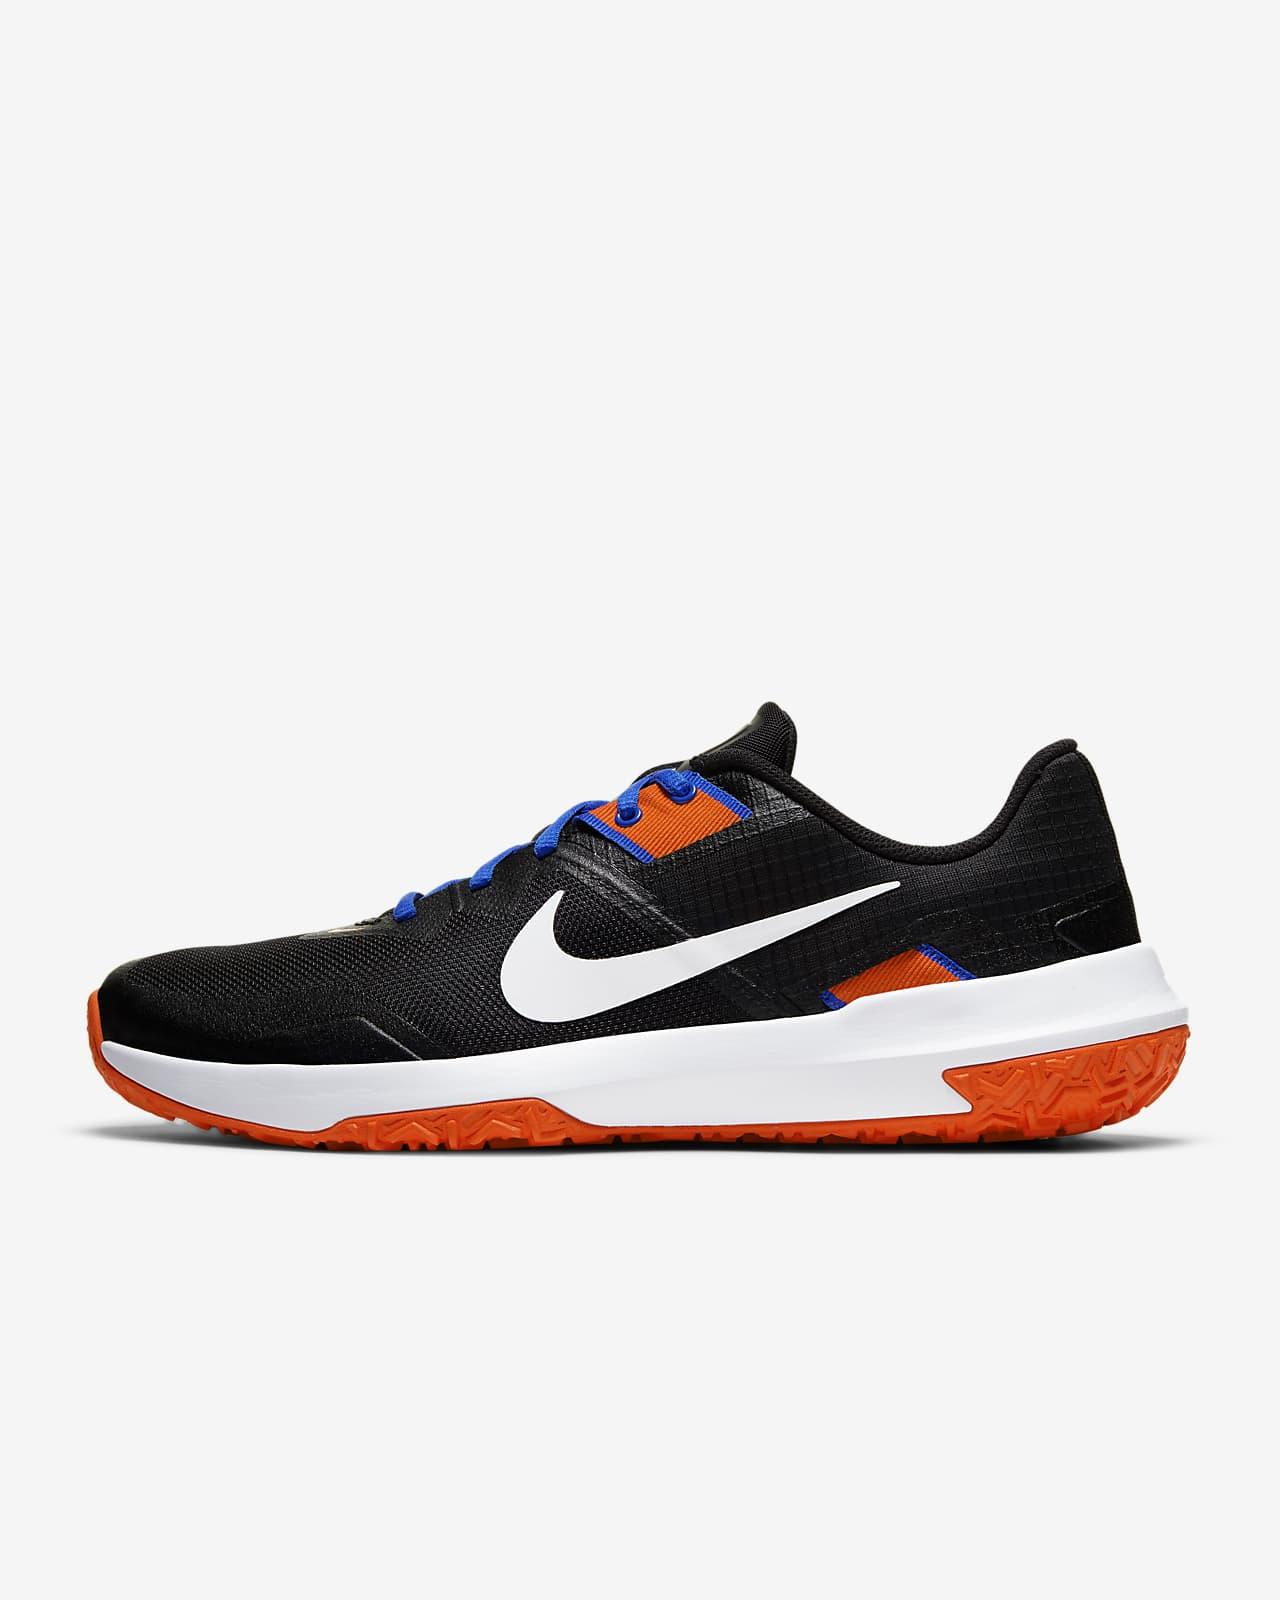 Pánská tréninková bota Nike Varsity Compete TR 3